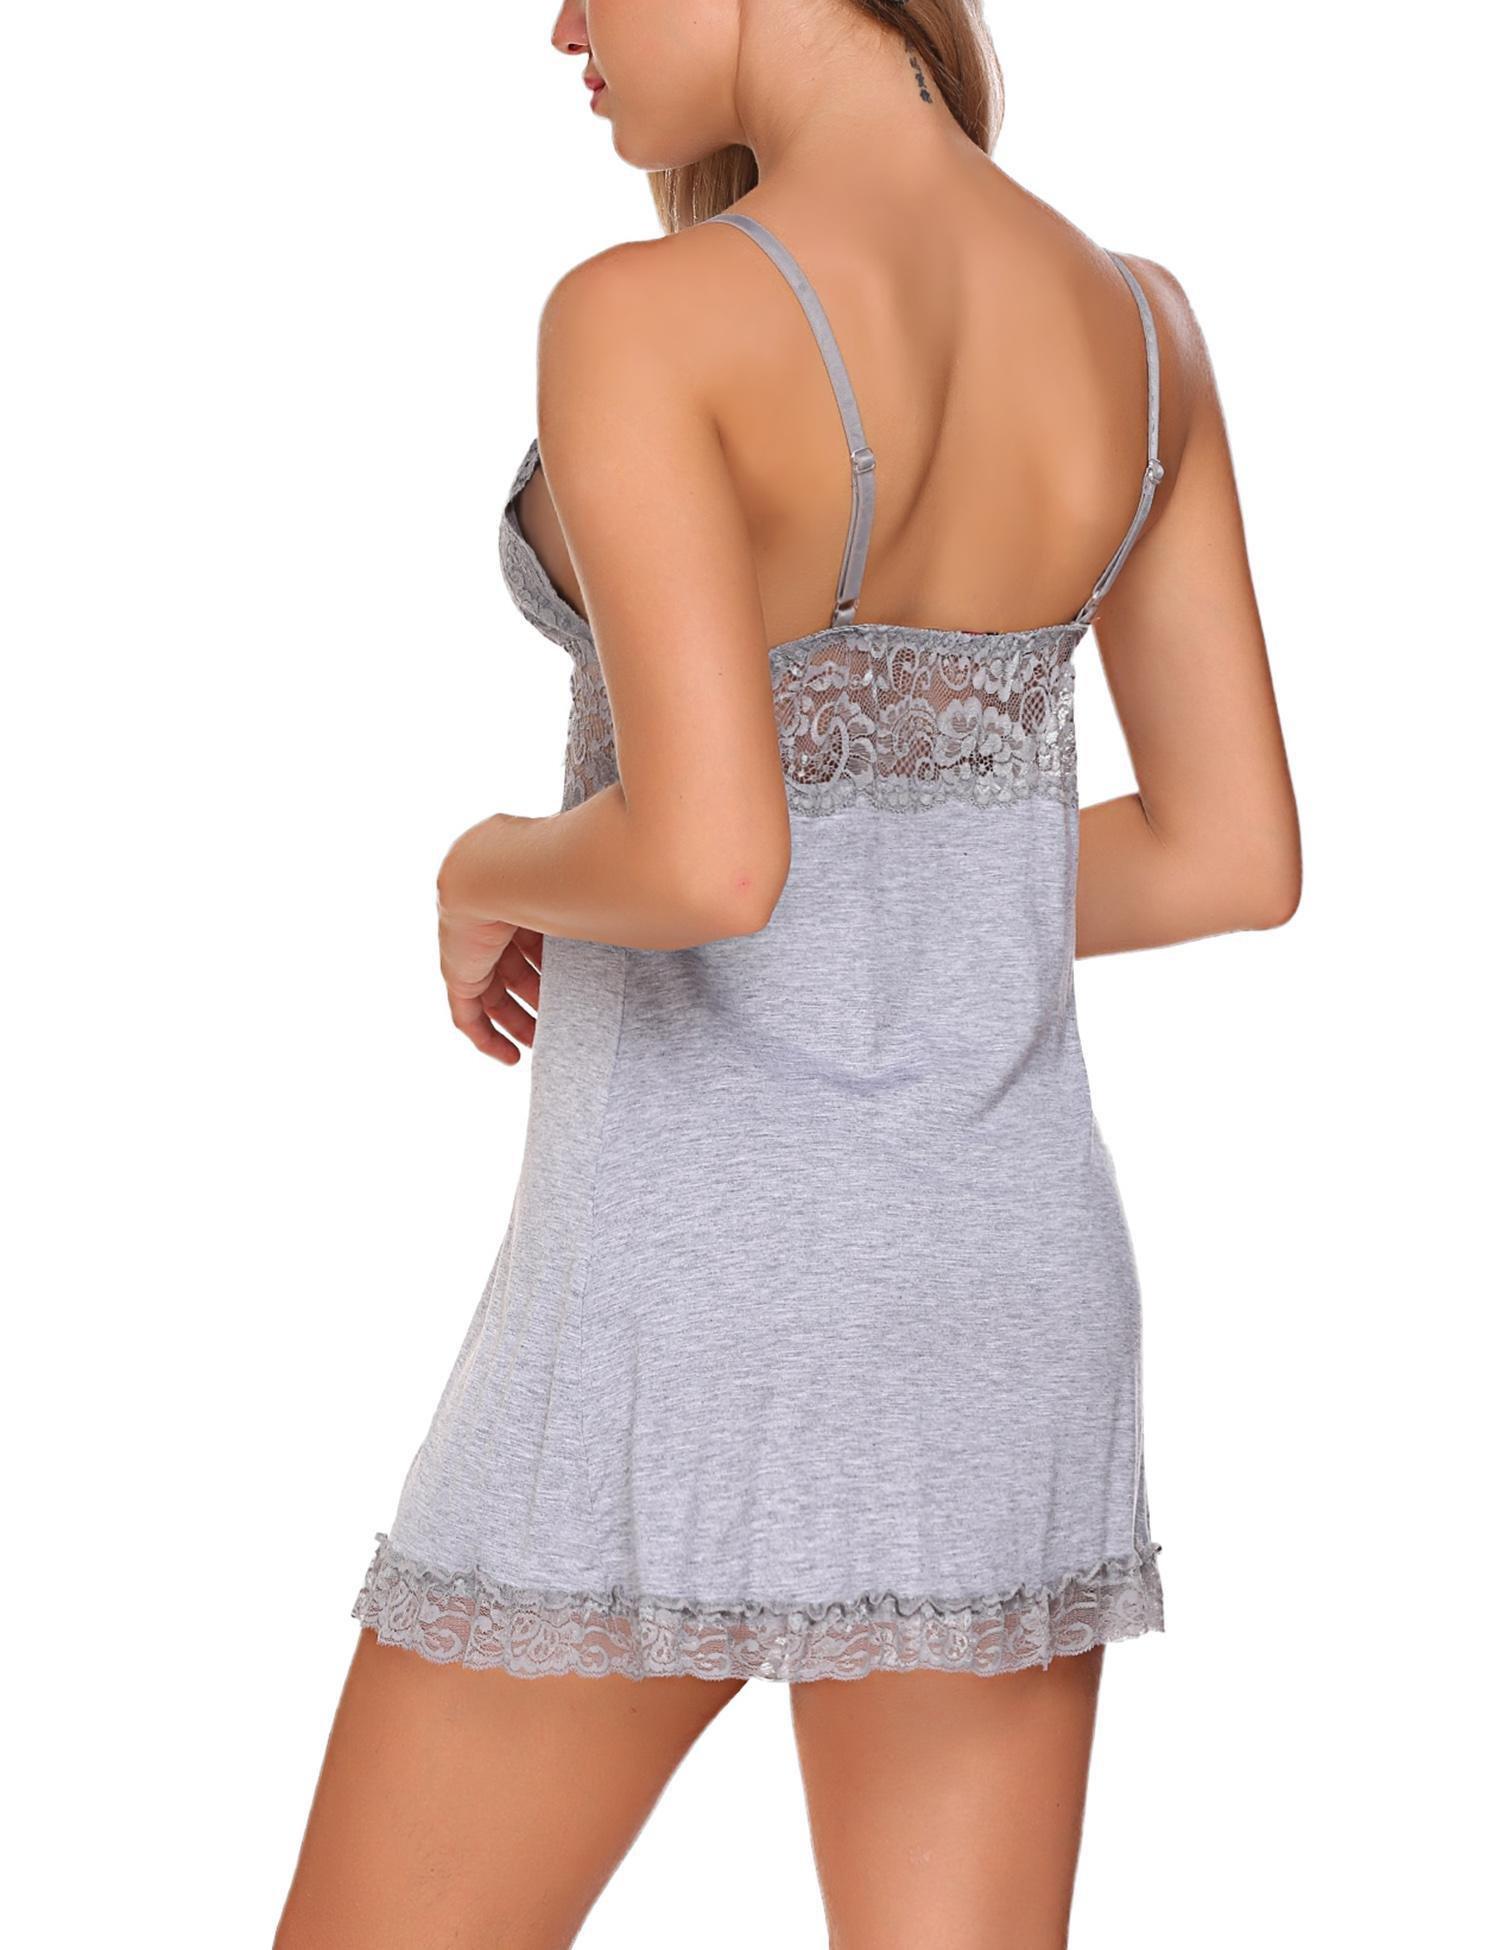 Avidlove Women Sexy Lingerie Slip V-Neck Chemise Nightgown Lace Babydoll Gray Small by Avidlove (Image #6)